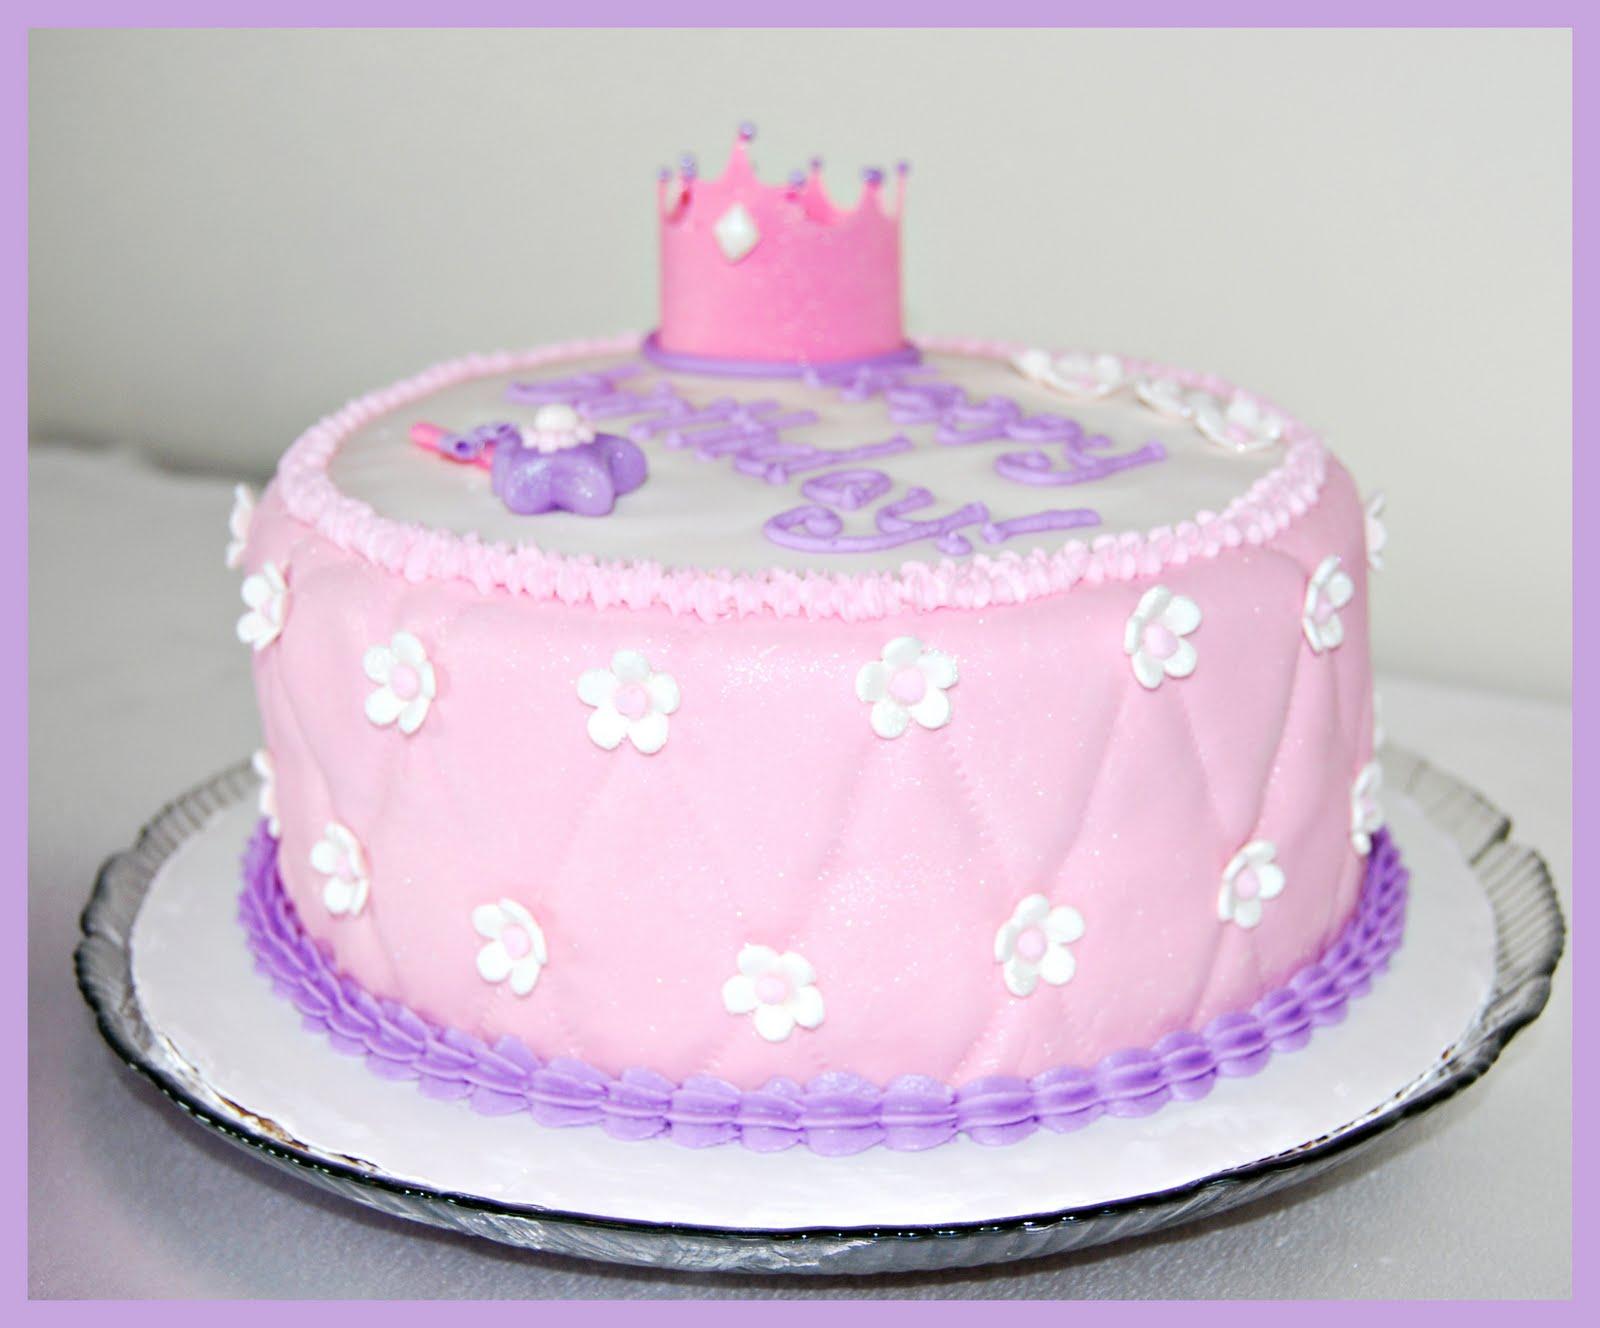 Birthday Cakes Utah ~ Birthday cakes utah county ~ image inspiration of cake and birthday